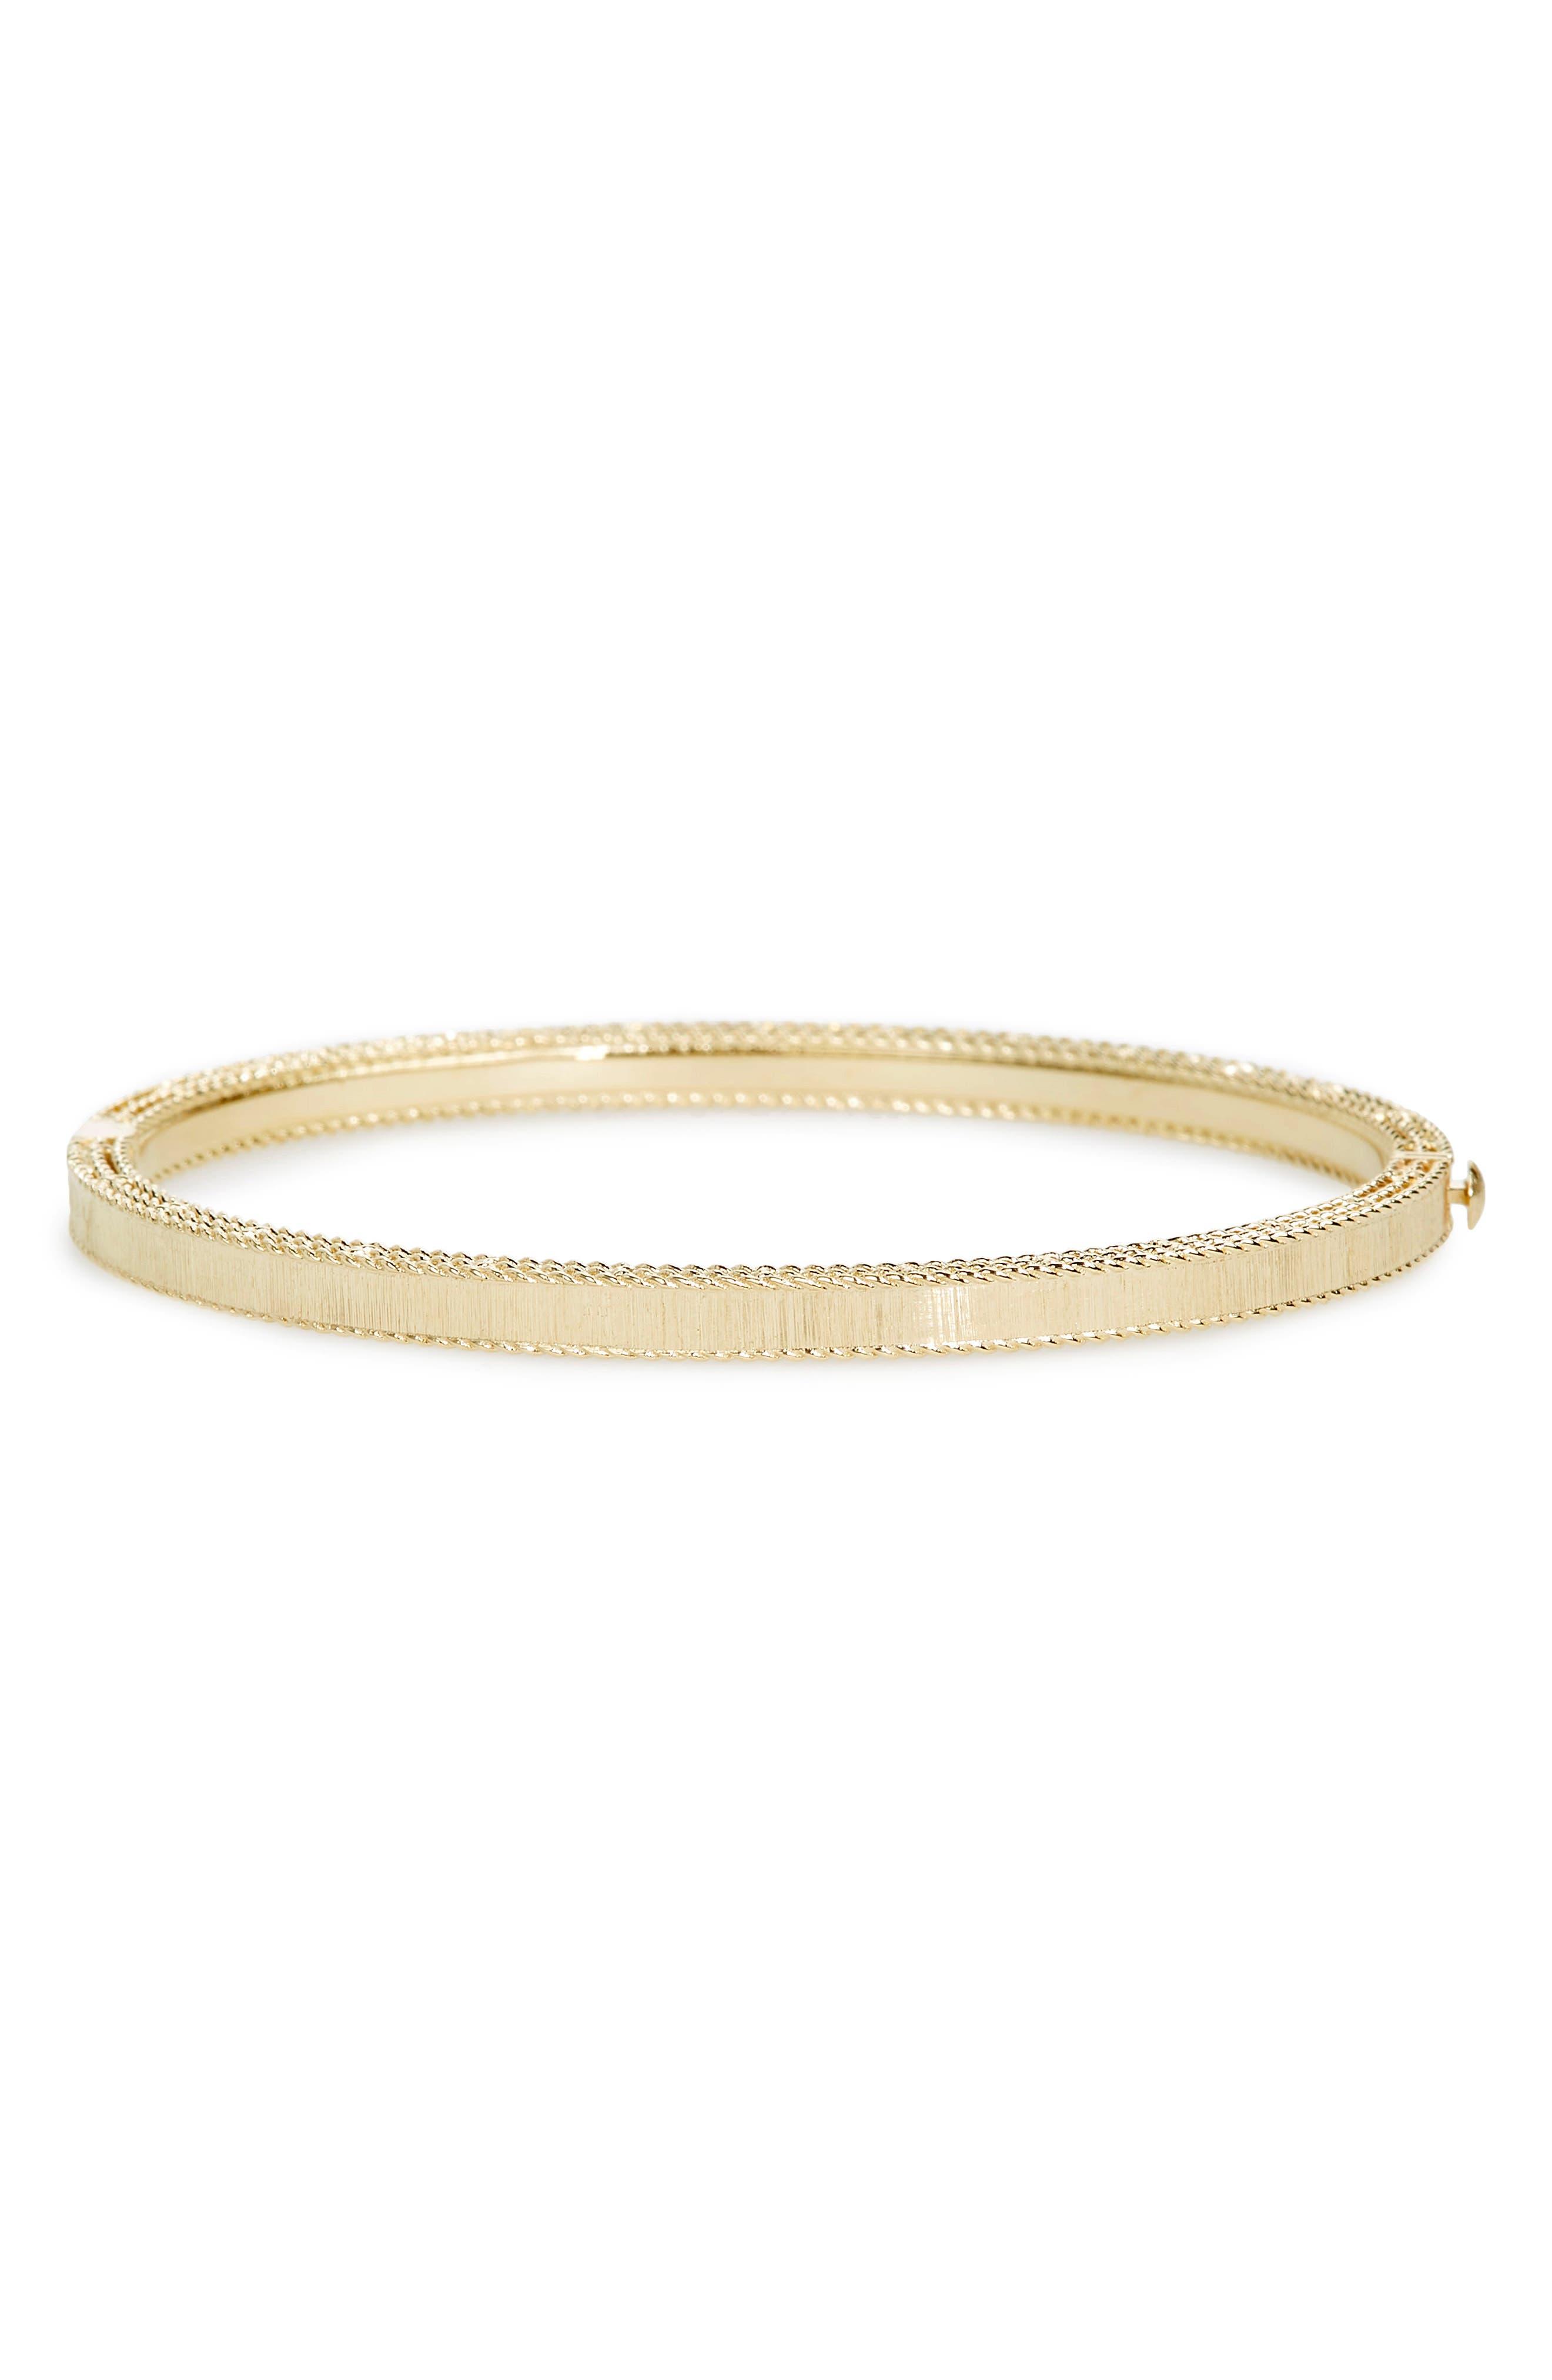 ROBERTO COIN,                             Princess Diamond Bracelet,                             Alternate thumbnail 2, color,                             YELLOW GOLD